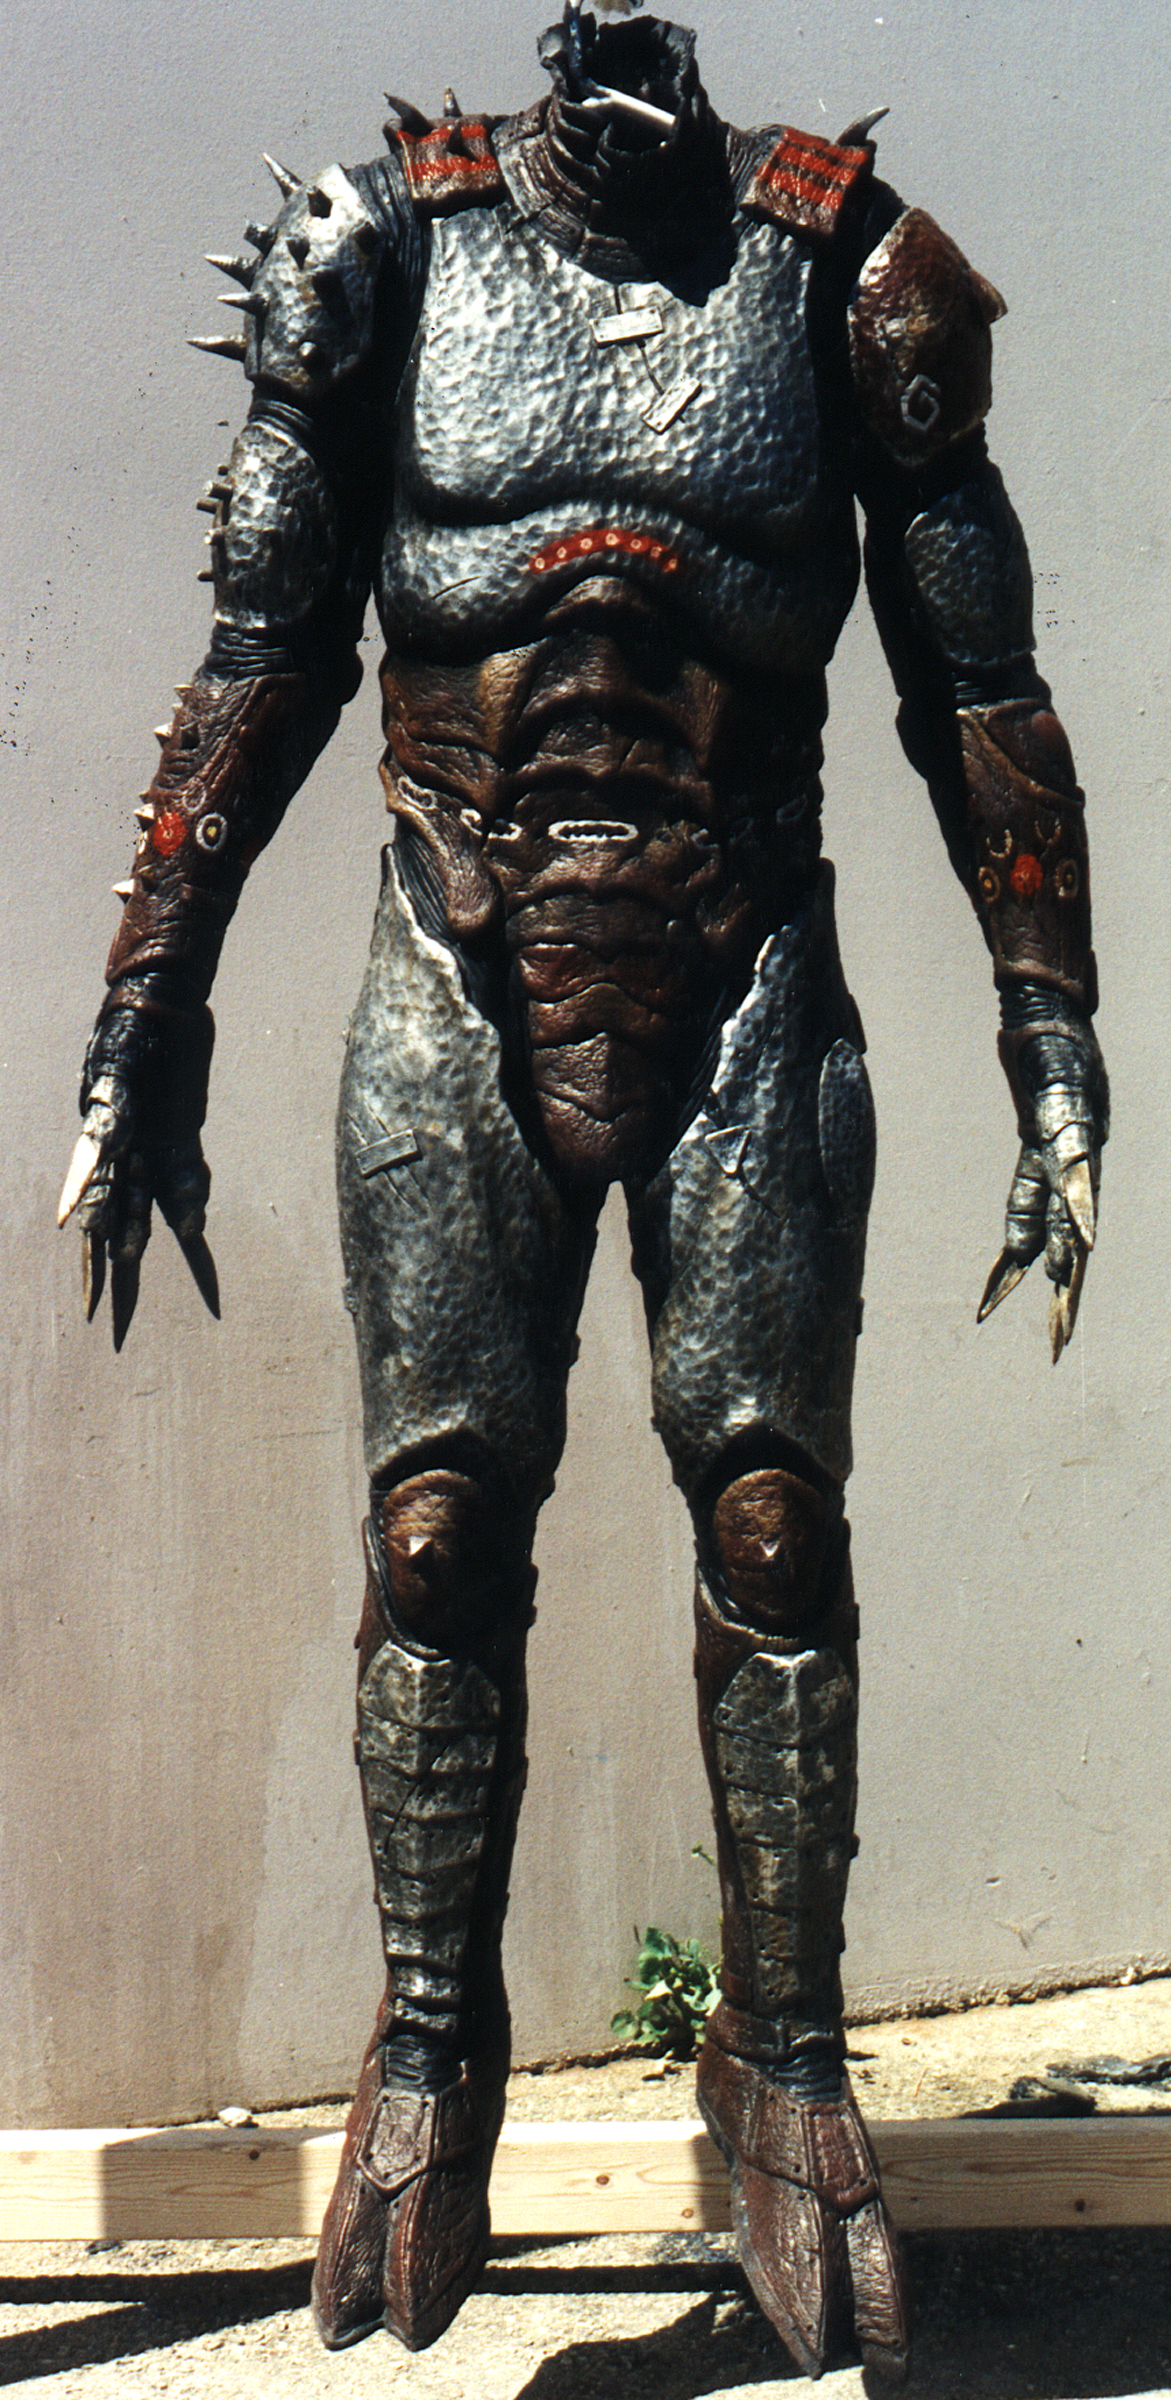 TankGirl_Ripper Suit 1.JPG